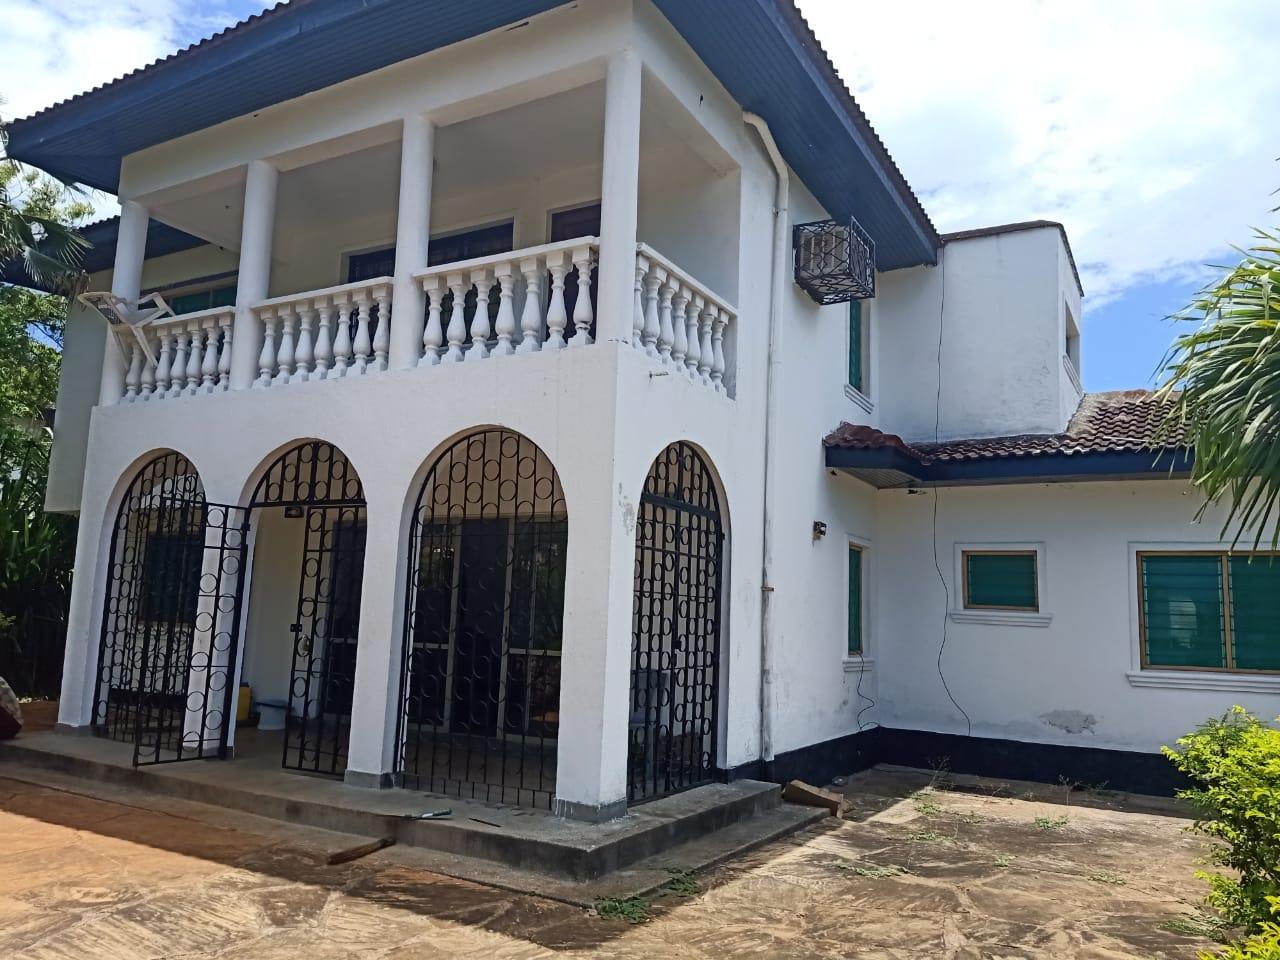 HOUSE FOR SALE IN KENYAN COAST, MOMBASA-NYALI